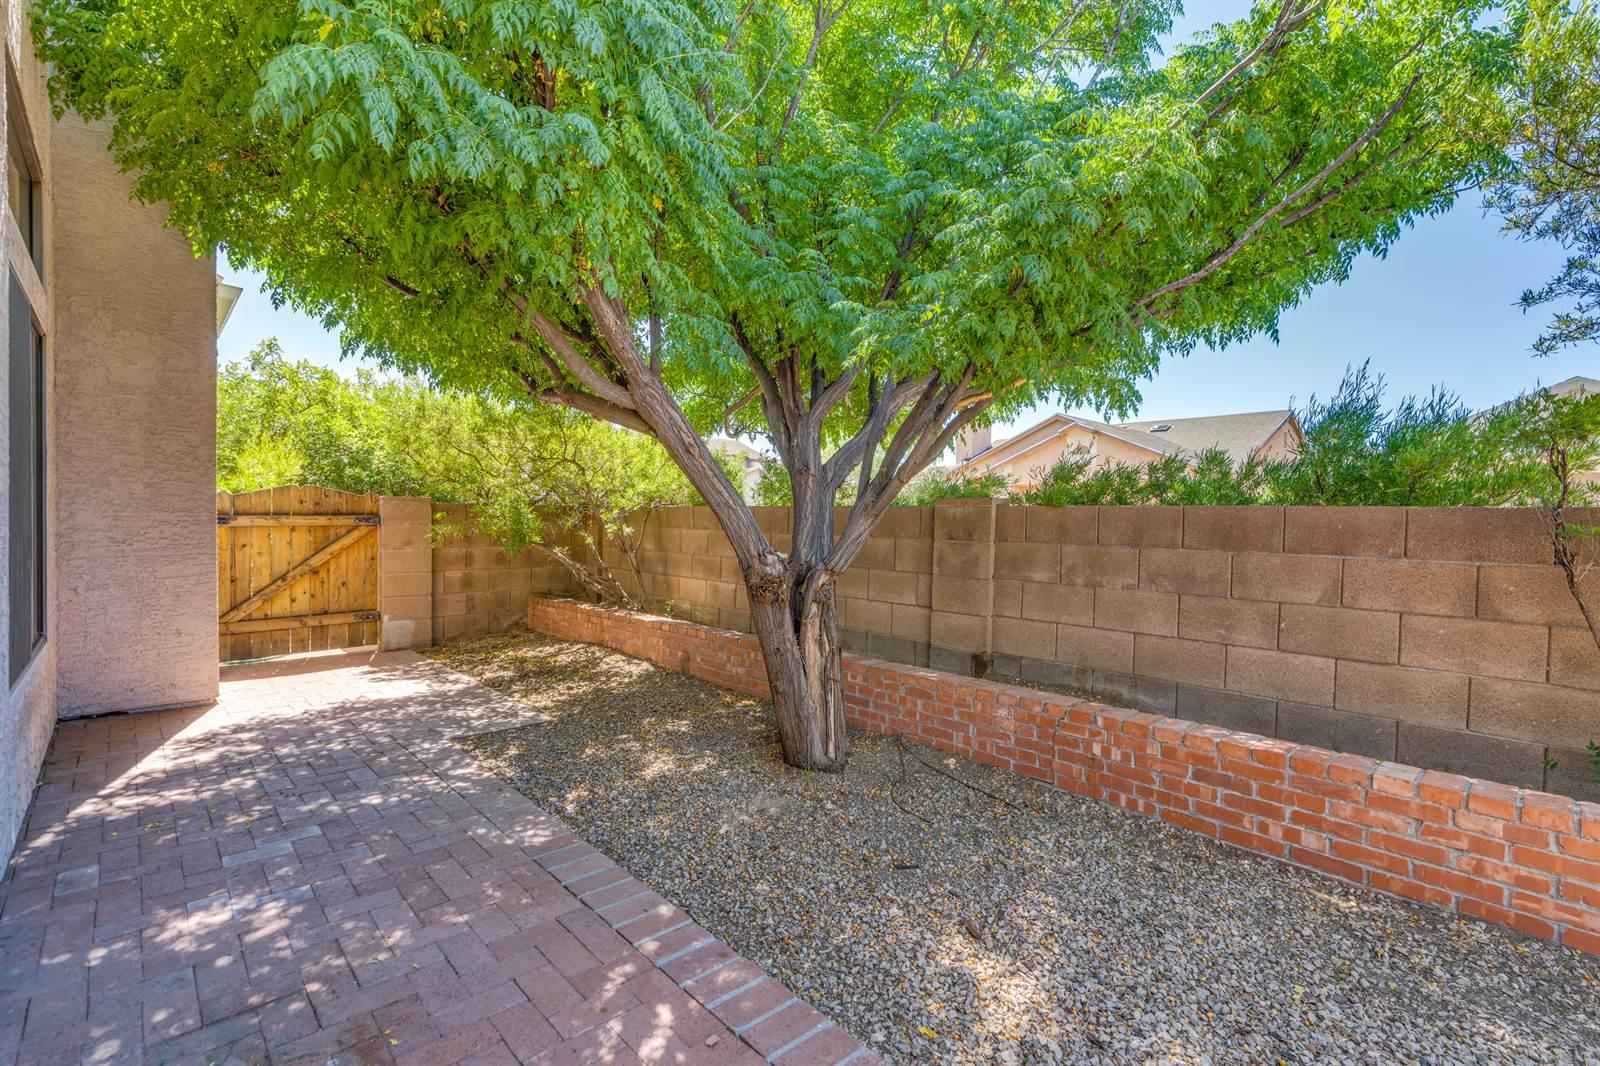 280 S Candlestick Dr, Tucson, AZ 85748